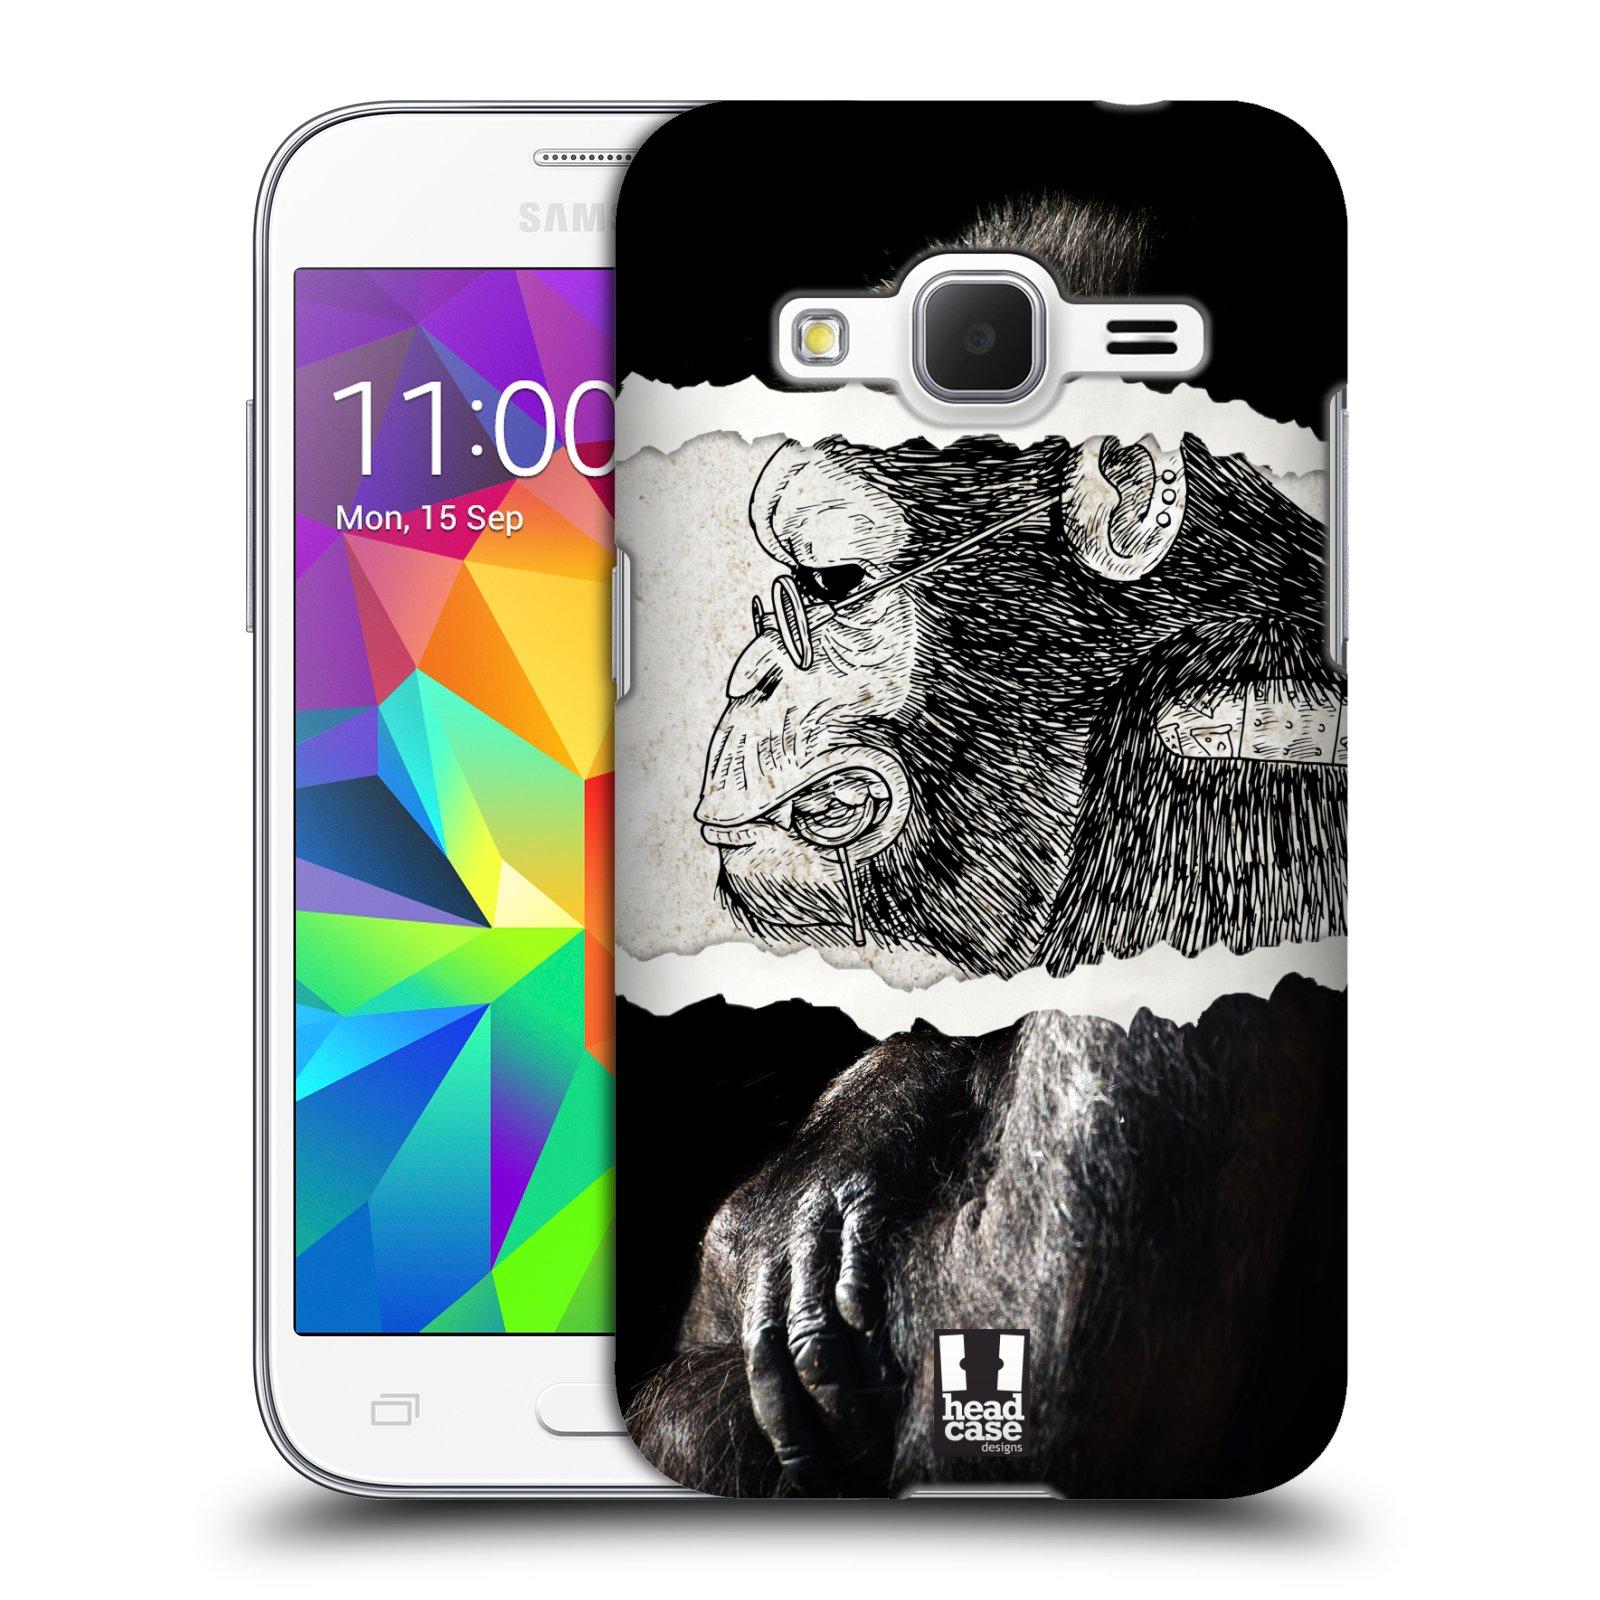 HEAD CASE plastový obal na mobil SAMSUNG GALAXY Core Prime (Core Prime VE) vzor zvířata koláž opice